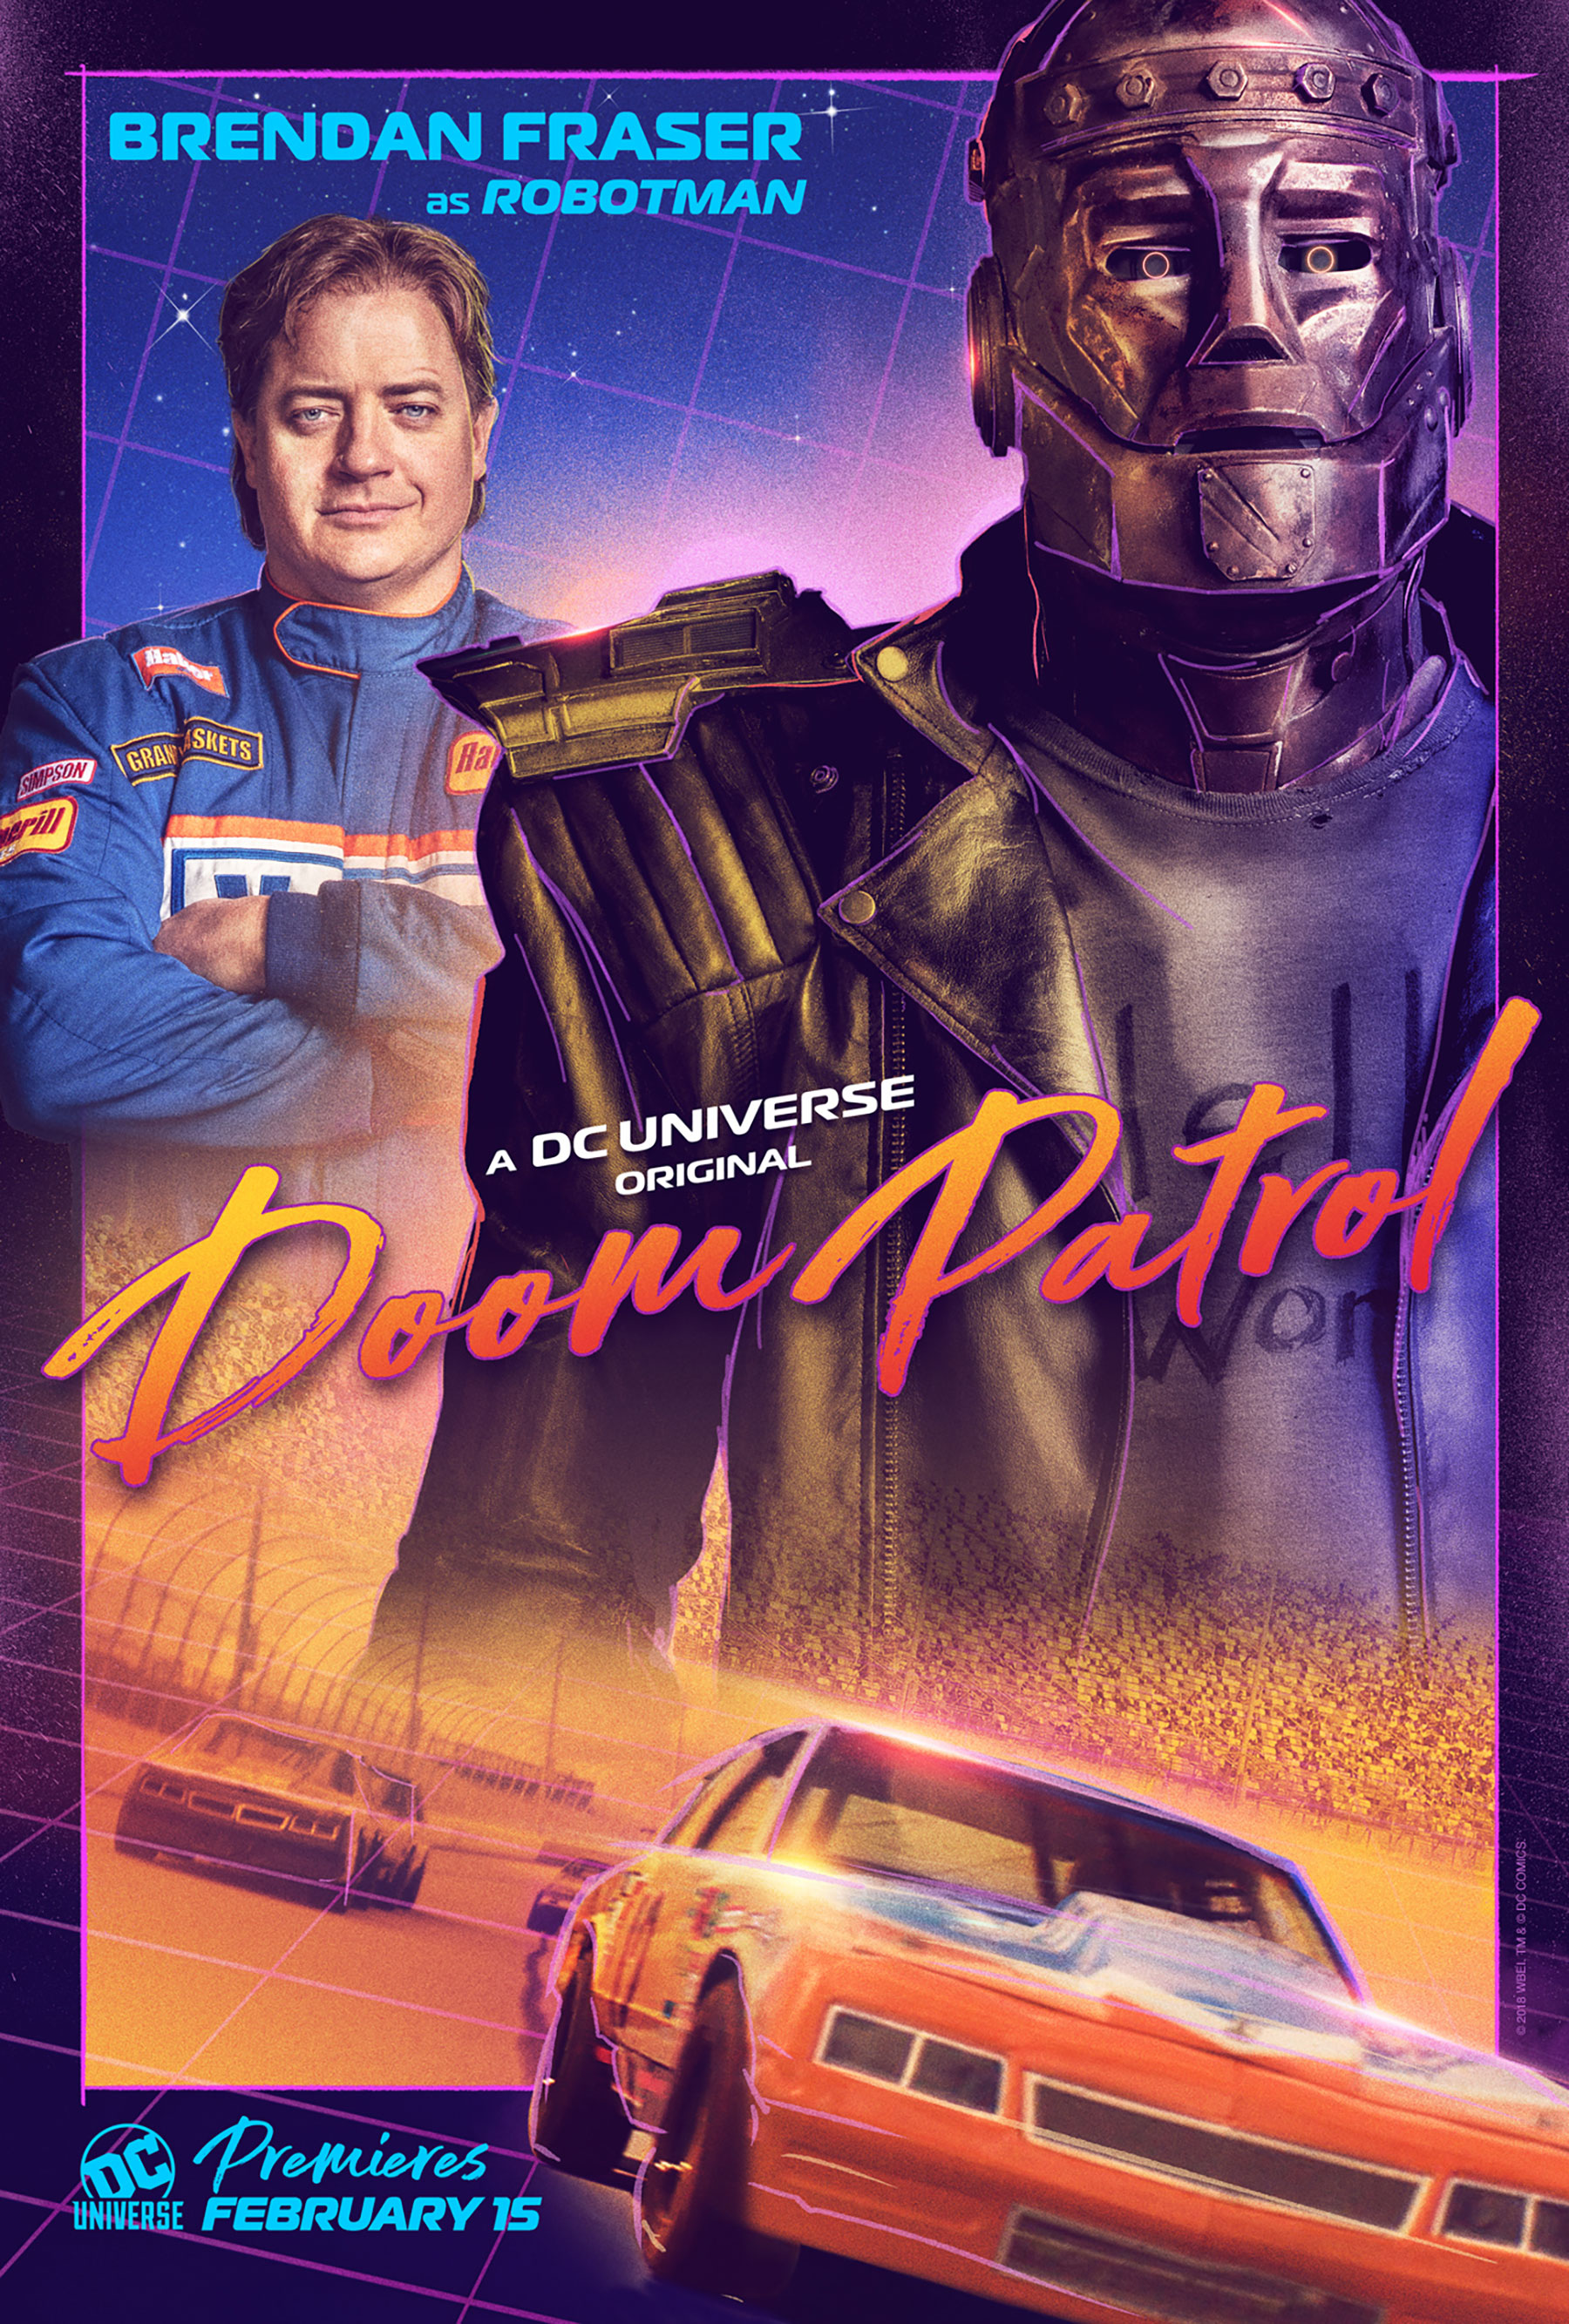 doompatrol_s1_teaser_robotman_1296x1920_f.jpg